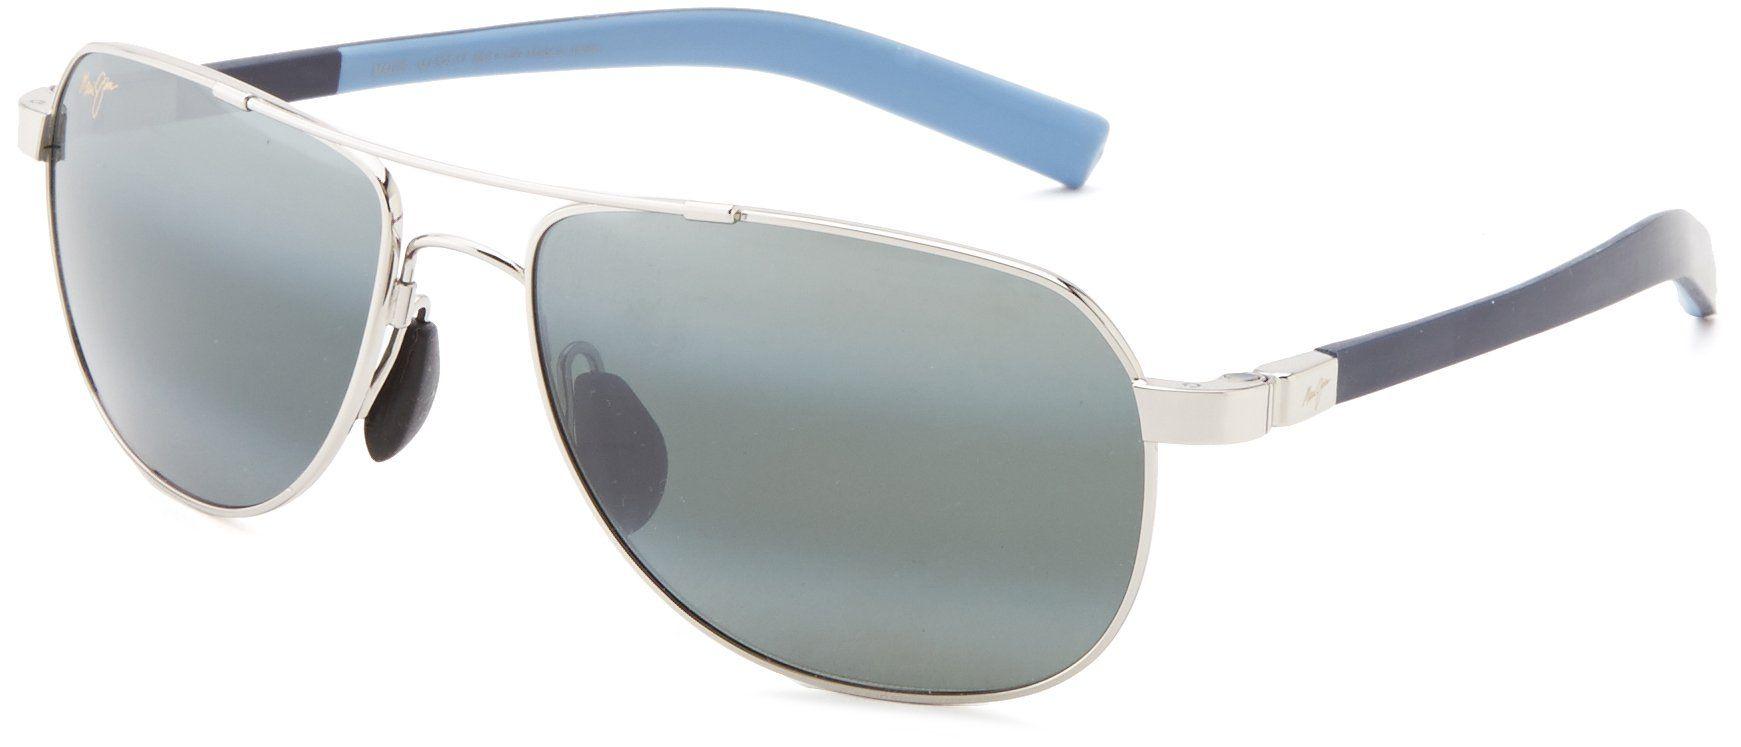 Maui Jim Guardrails 32717 Polarized Aviator SunglassesSilver Frame ...